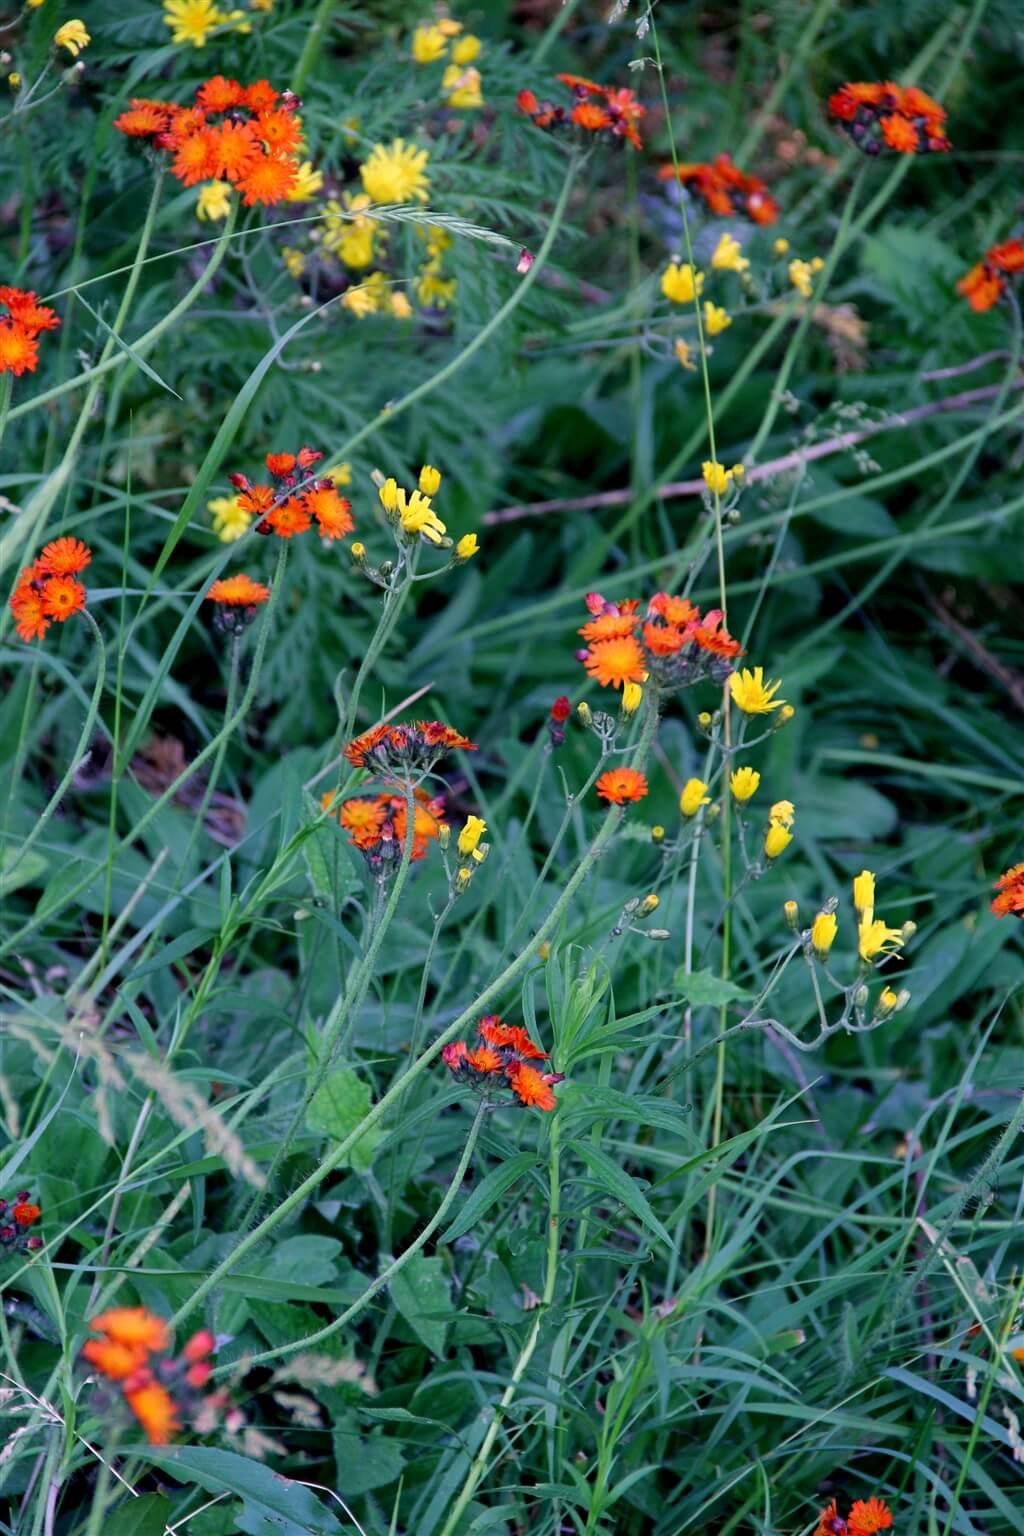 Photo of orange and yellow wildflowers at Mackinaw Mill Creek Camping in Mackinaw City, MI. © 2016 Frank Rogala.